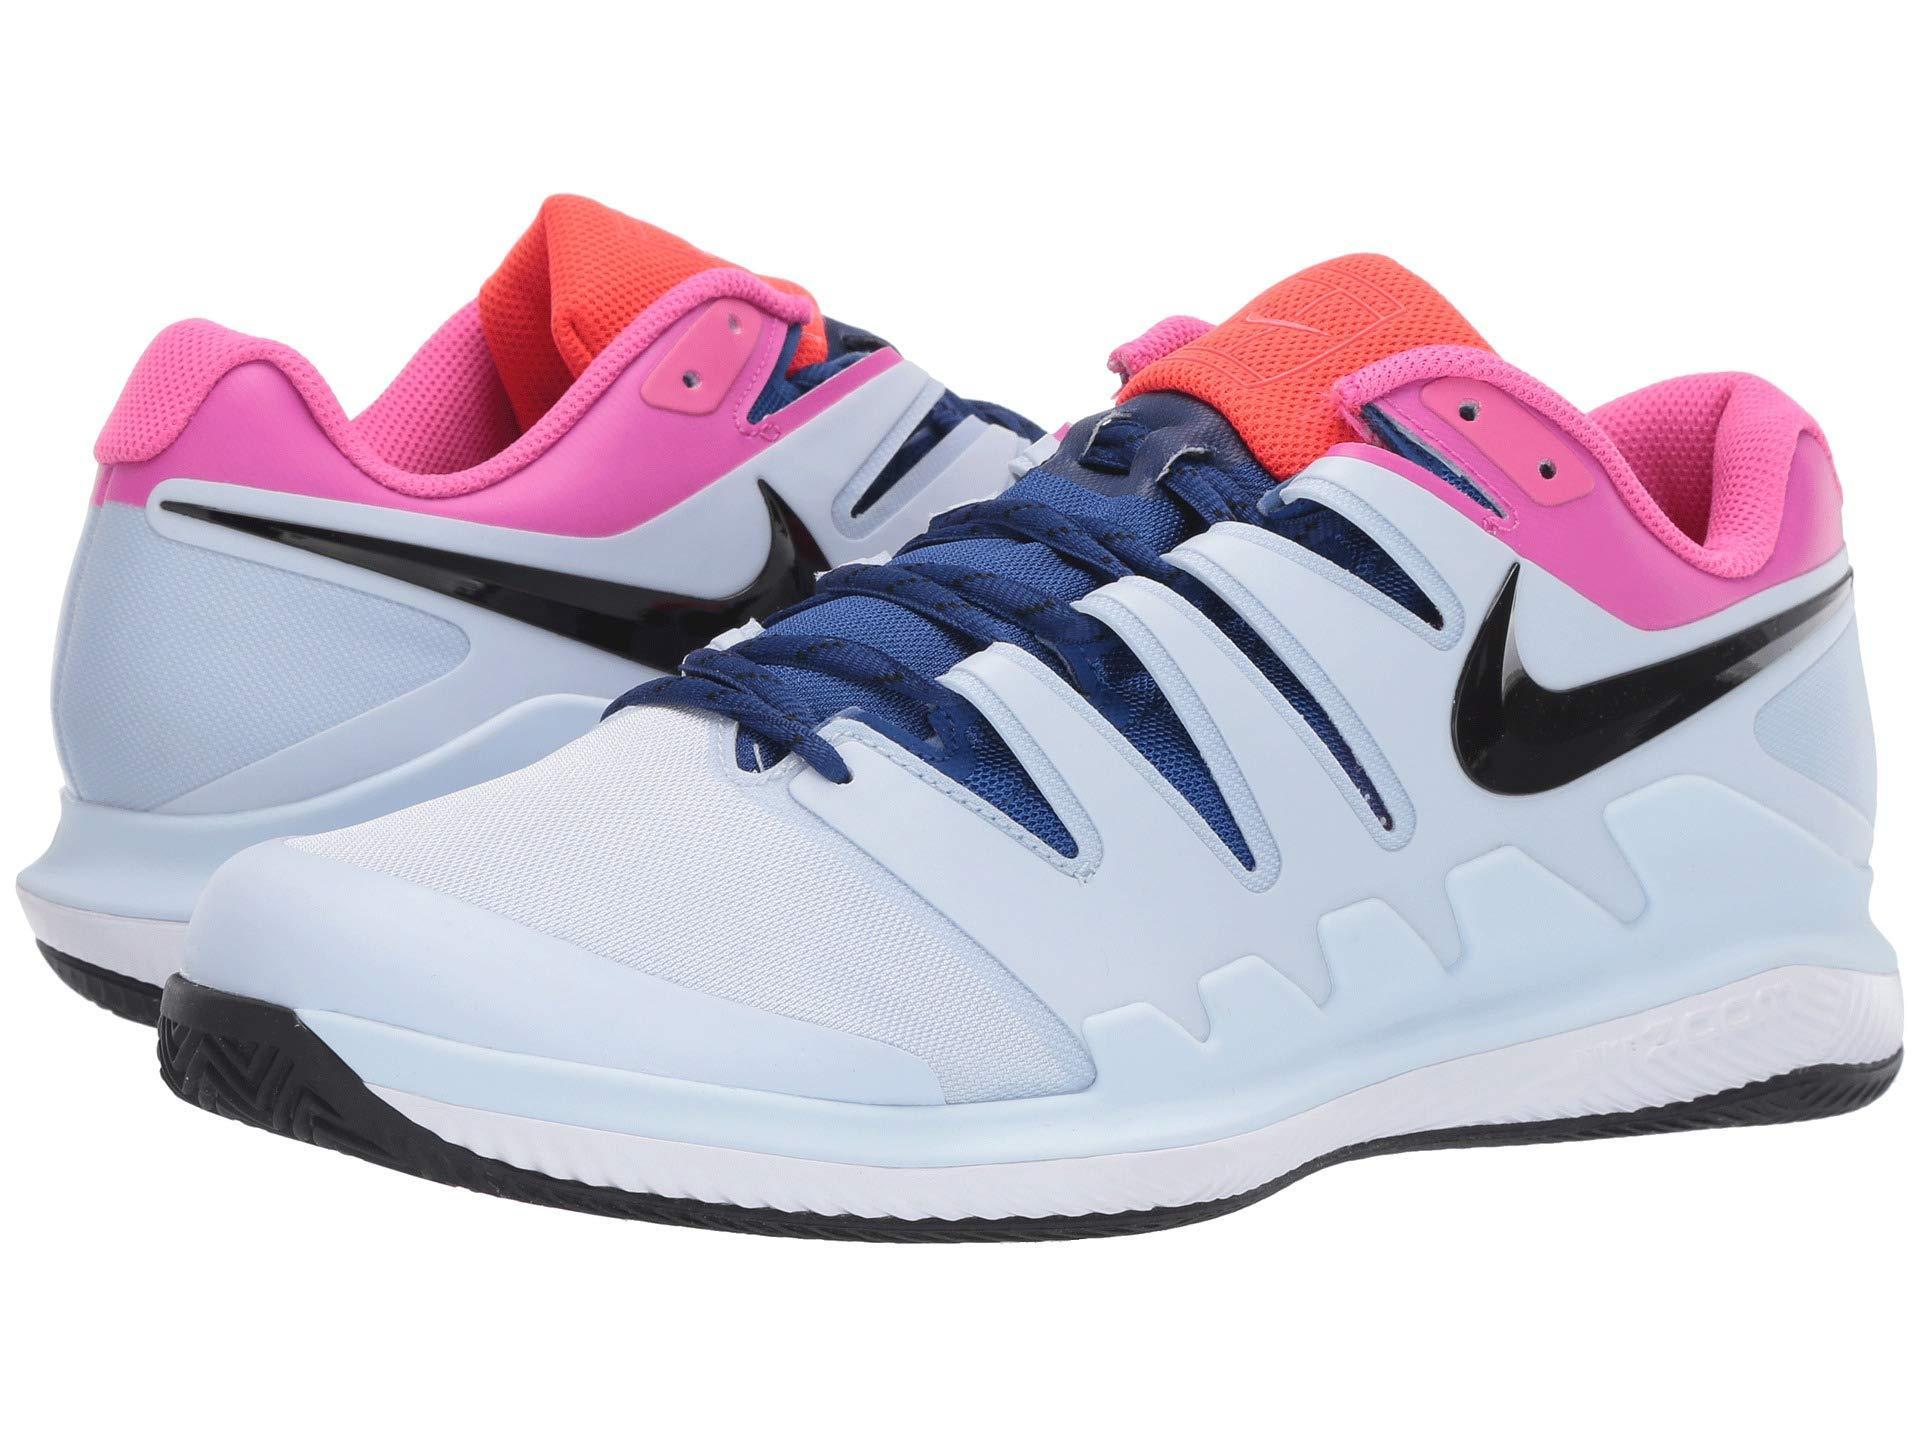 Nike Air Zoom Vapor X Clay Tennis Shoe in Blue for Men - Lyst